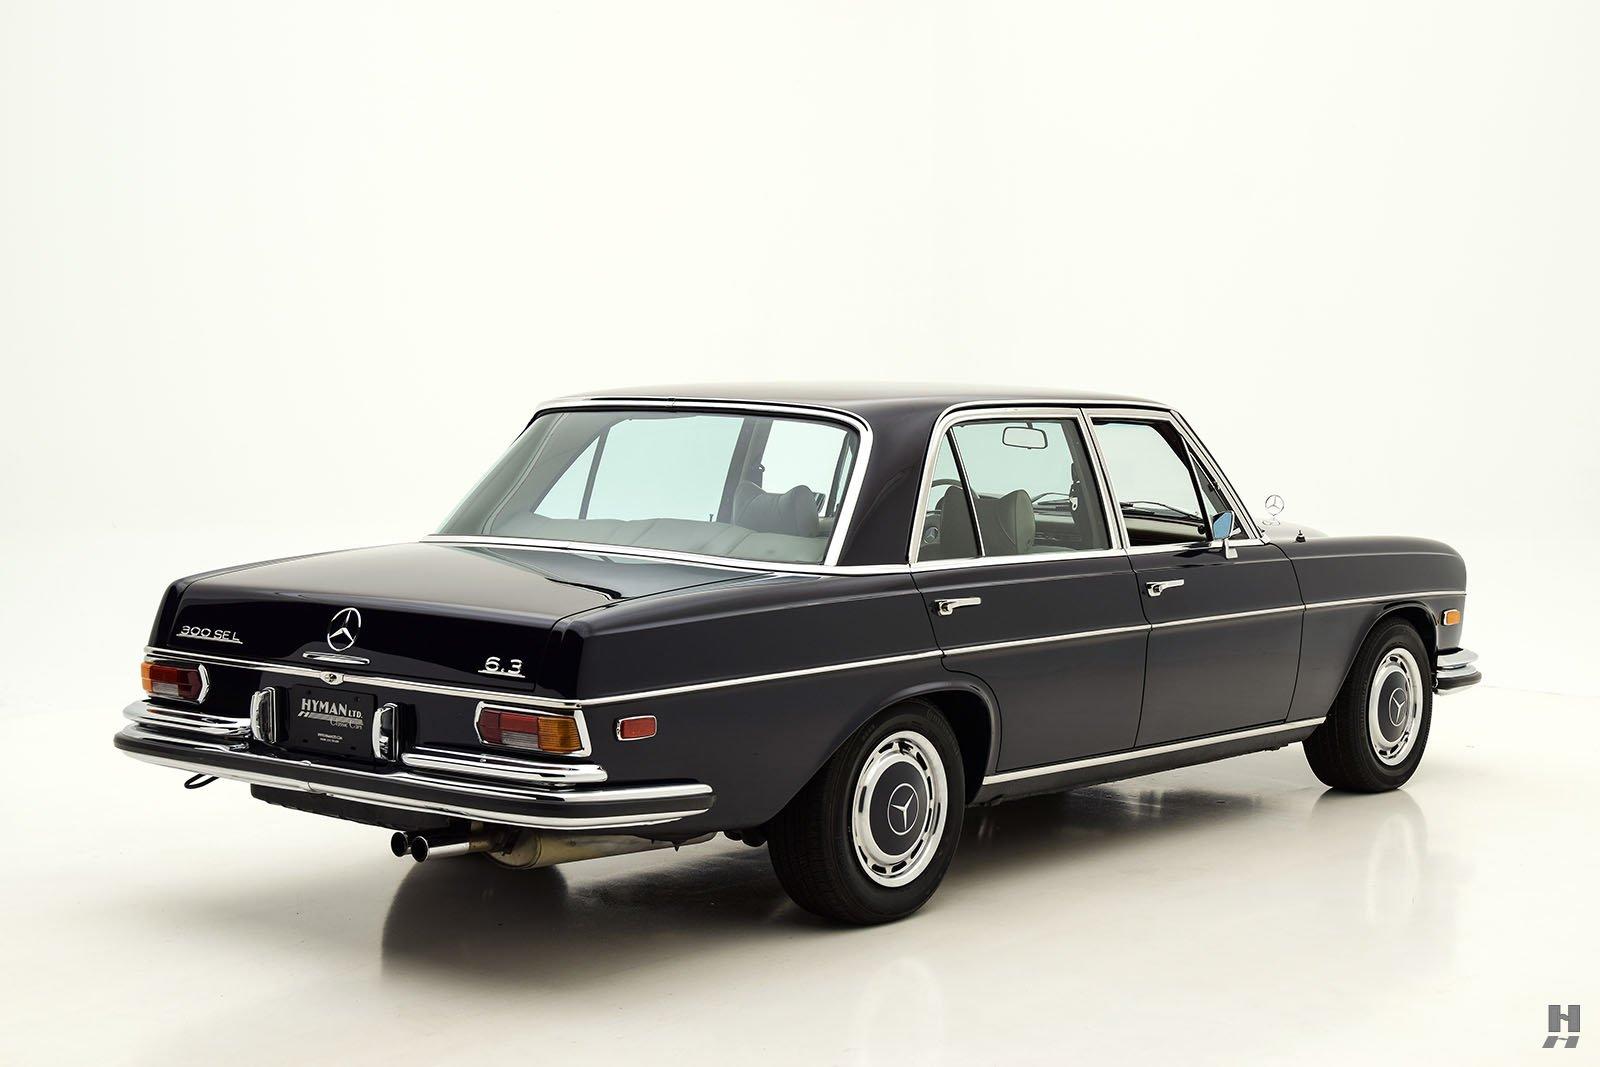 1970 mercedes benz 300 sel 6 3 sedan hyman ltd classic cars for Buy old mercedes benz